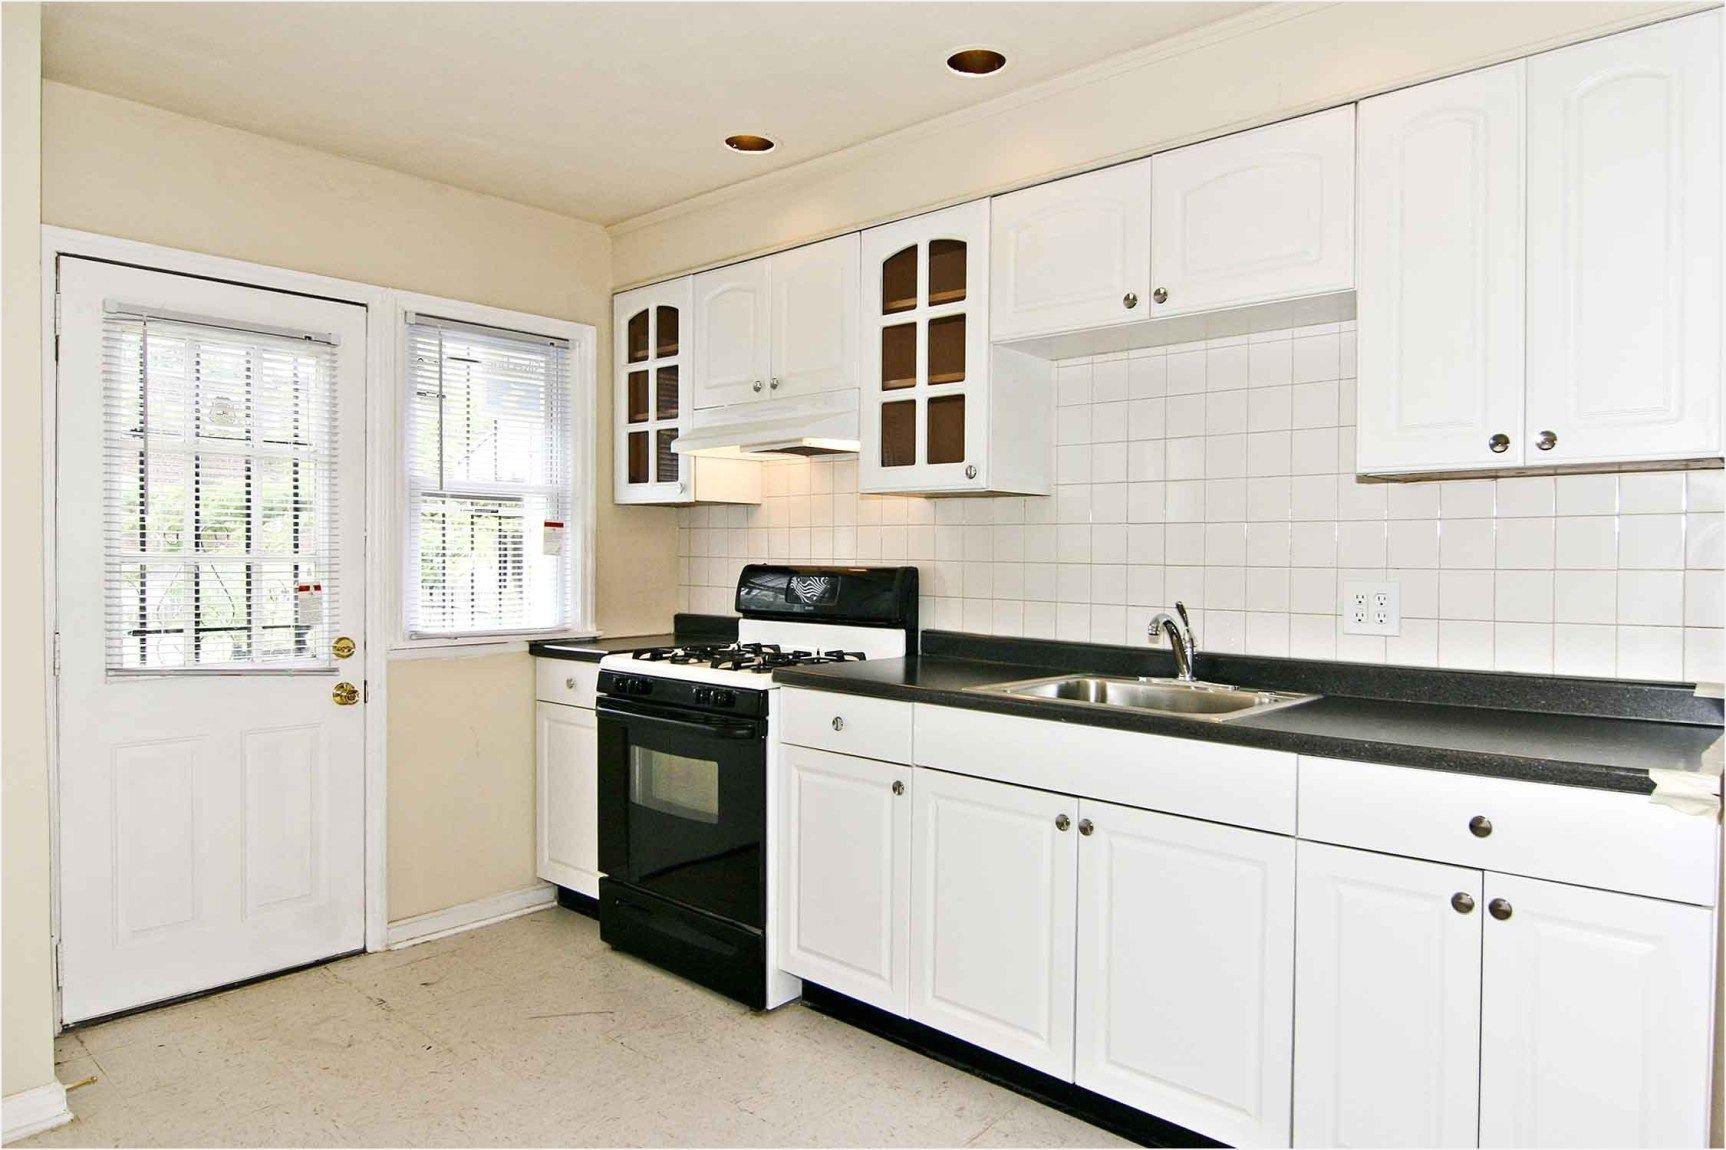 43 Perfect Kitchen Ideas With White Cabinets 14 Kitchen Backsplash